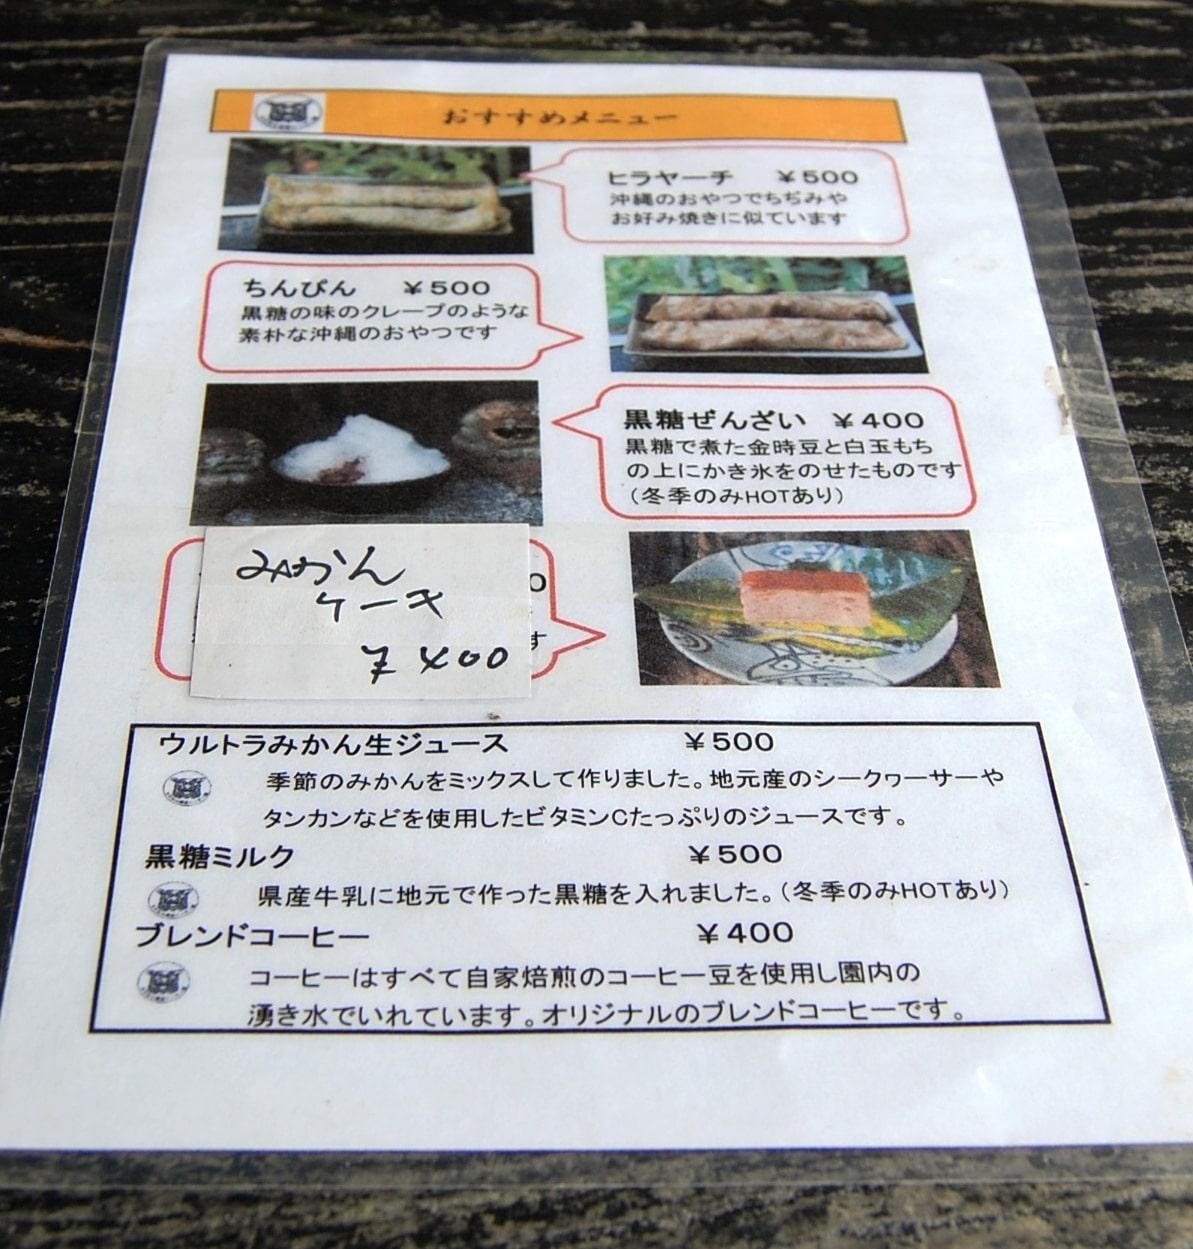 Yachimun Café l Okinawa Hai!